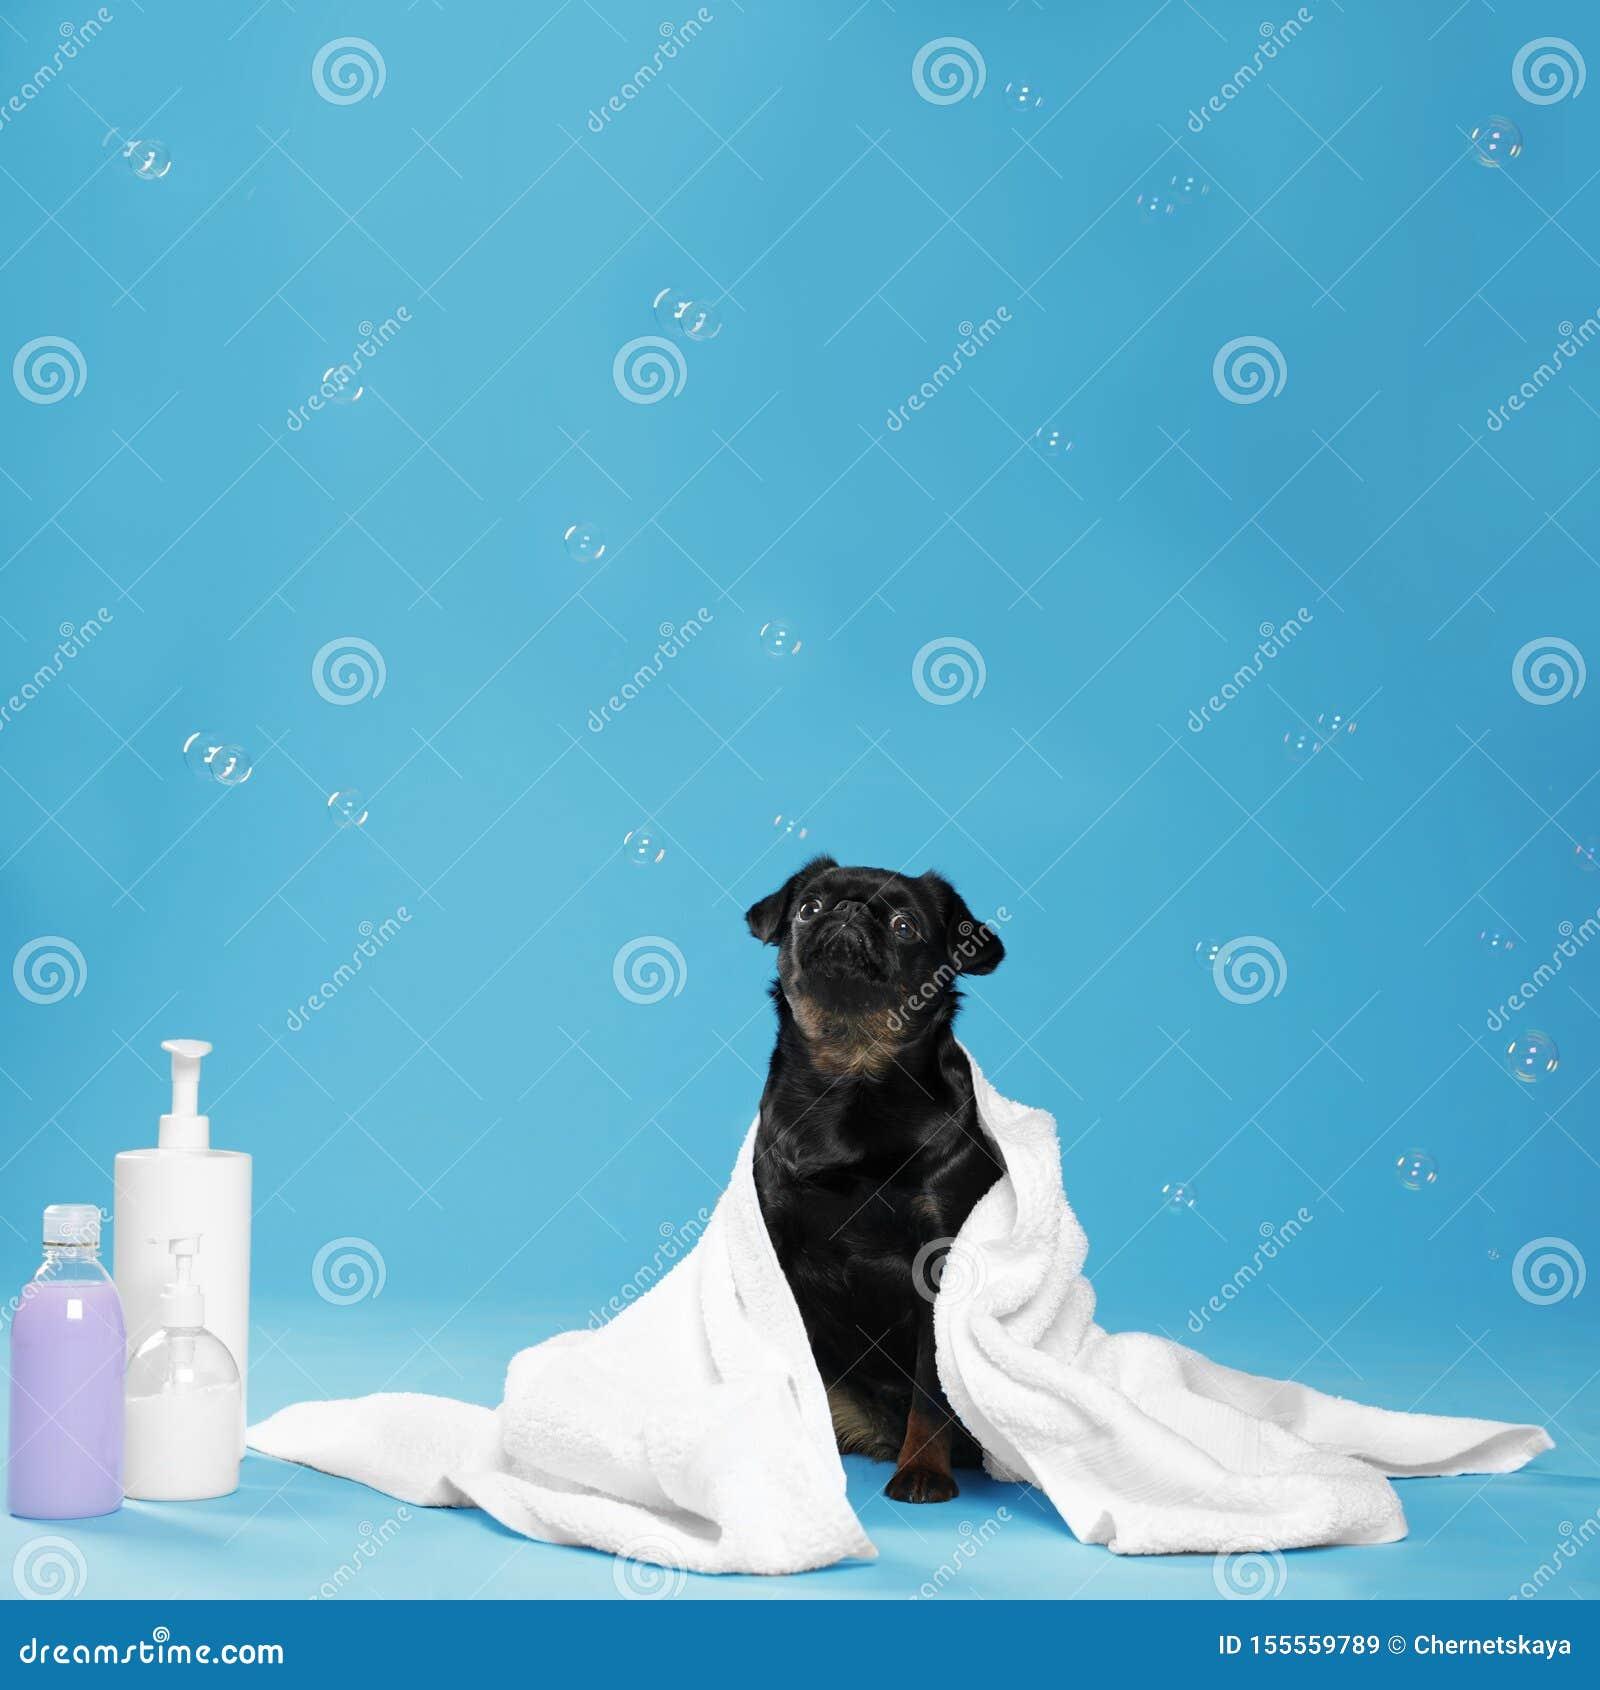 Cute black Petit dog, bath accessories and bubbles on light blue background